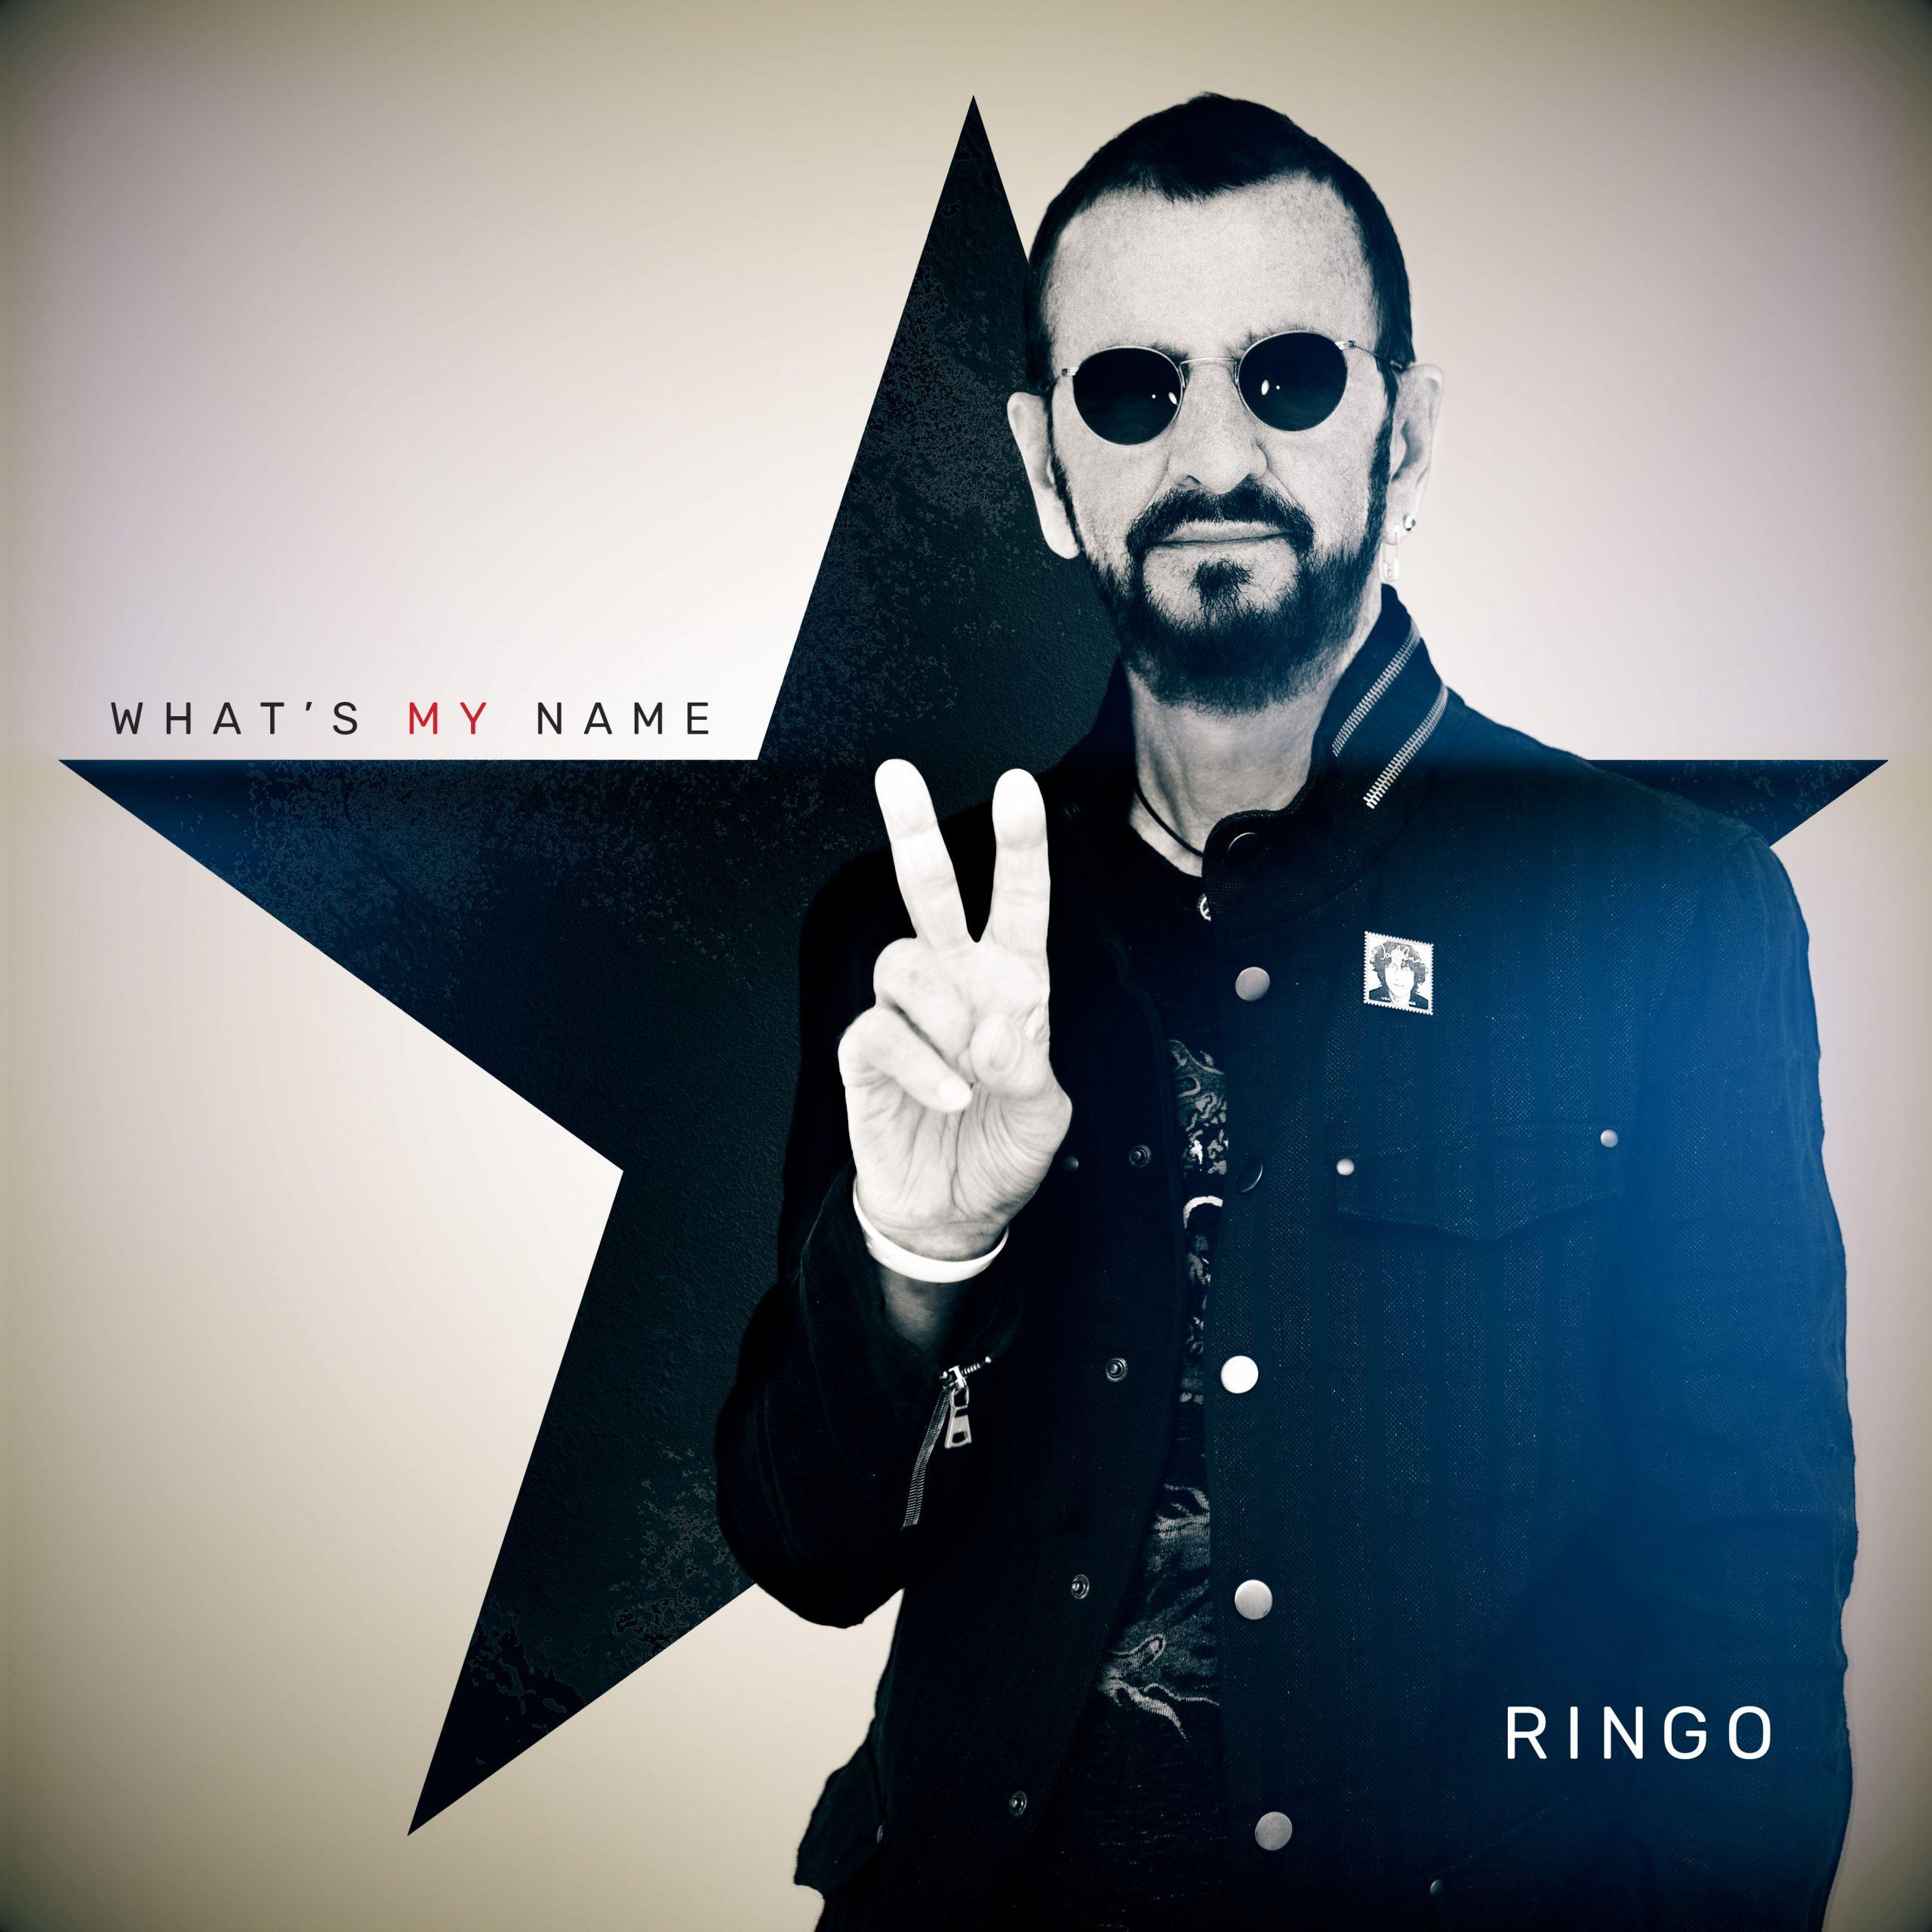 ringo starr what's my name album cover